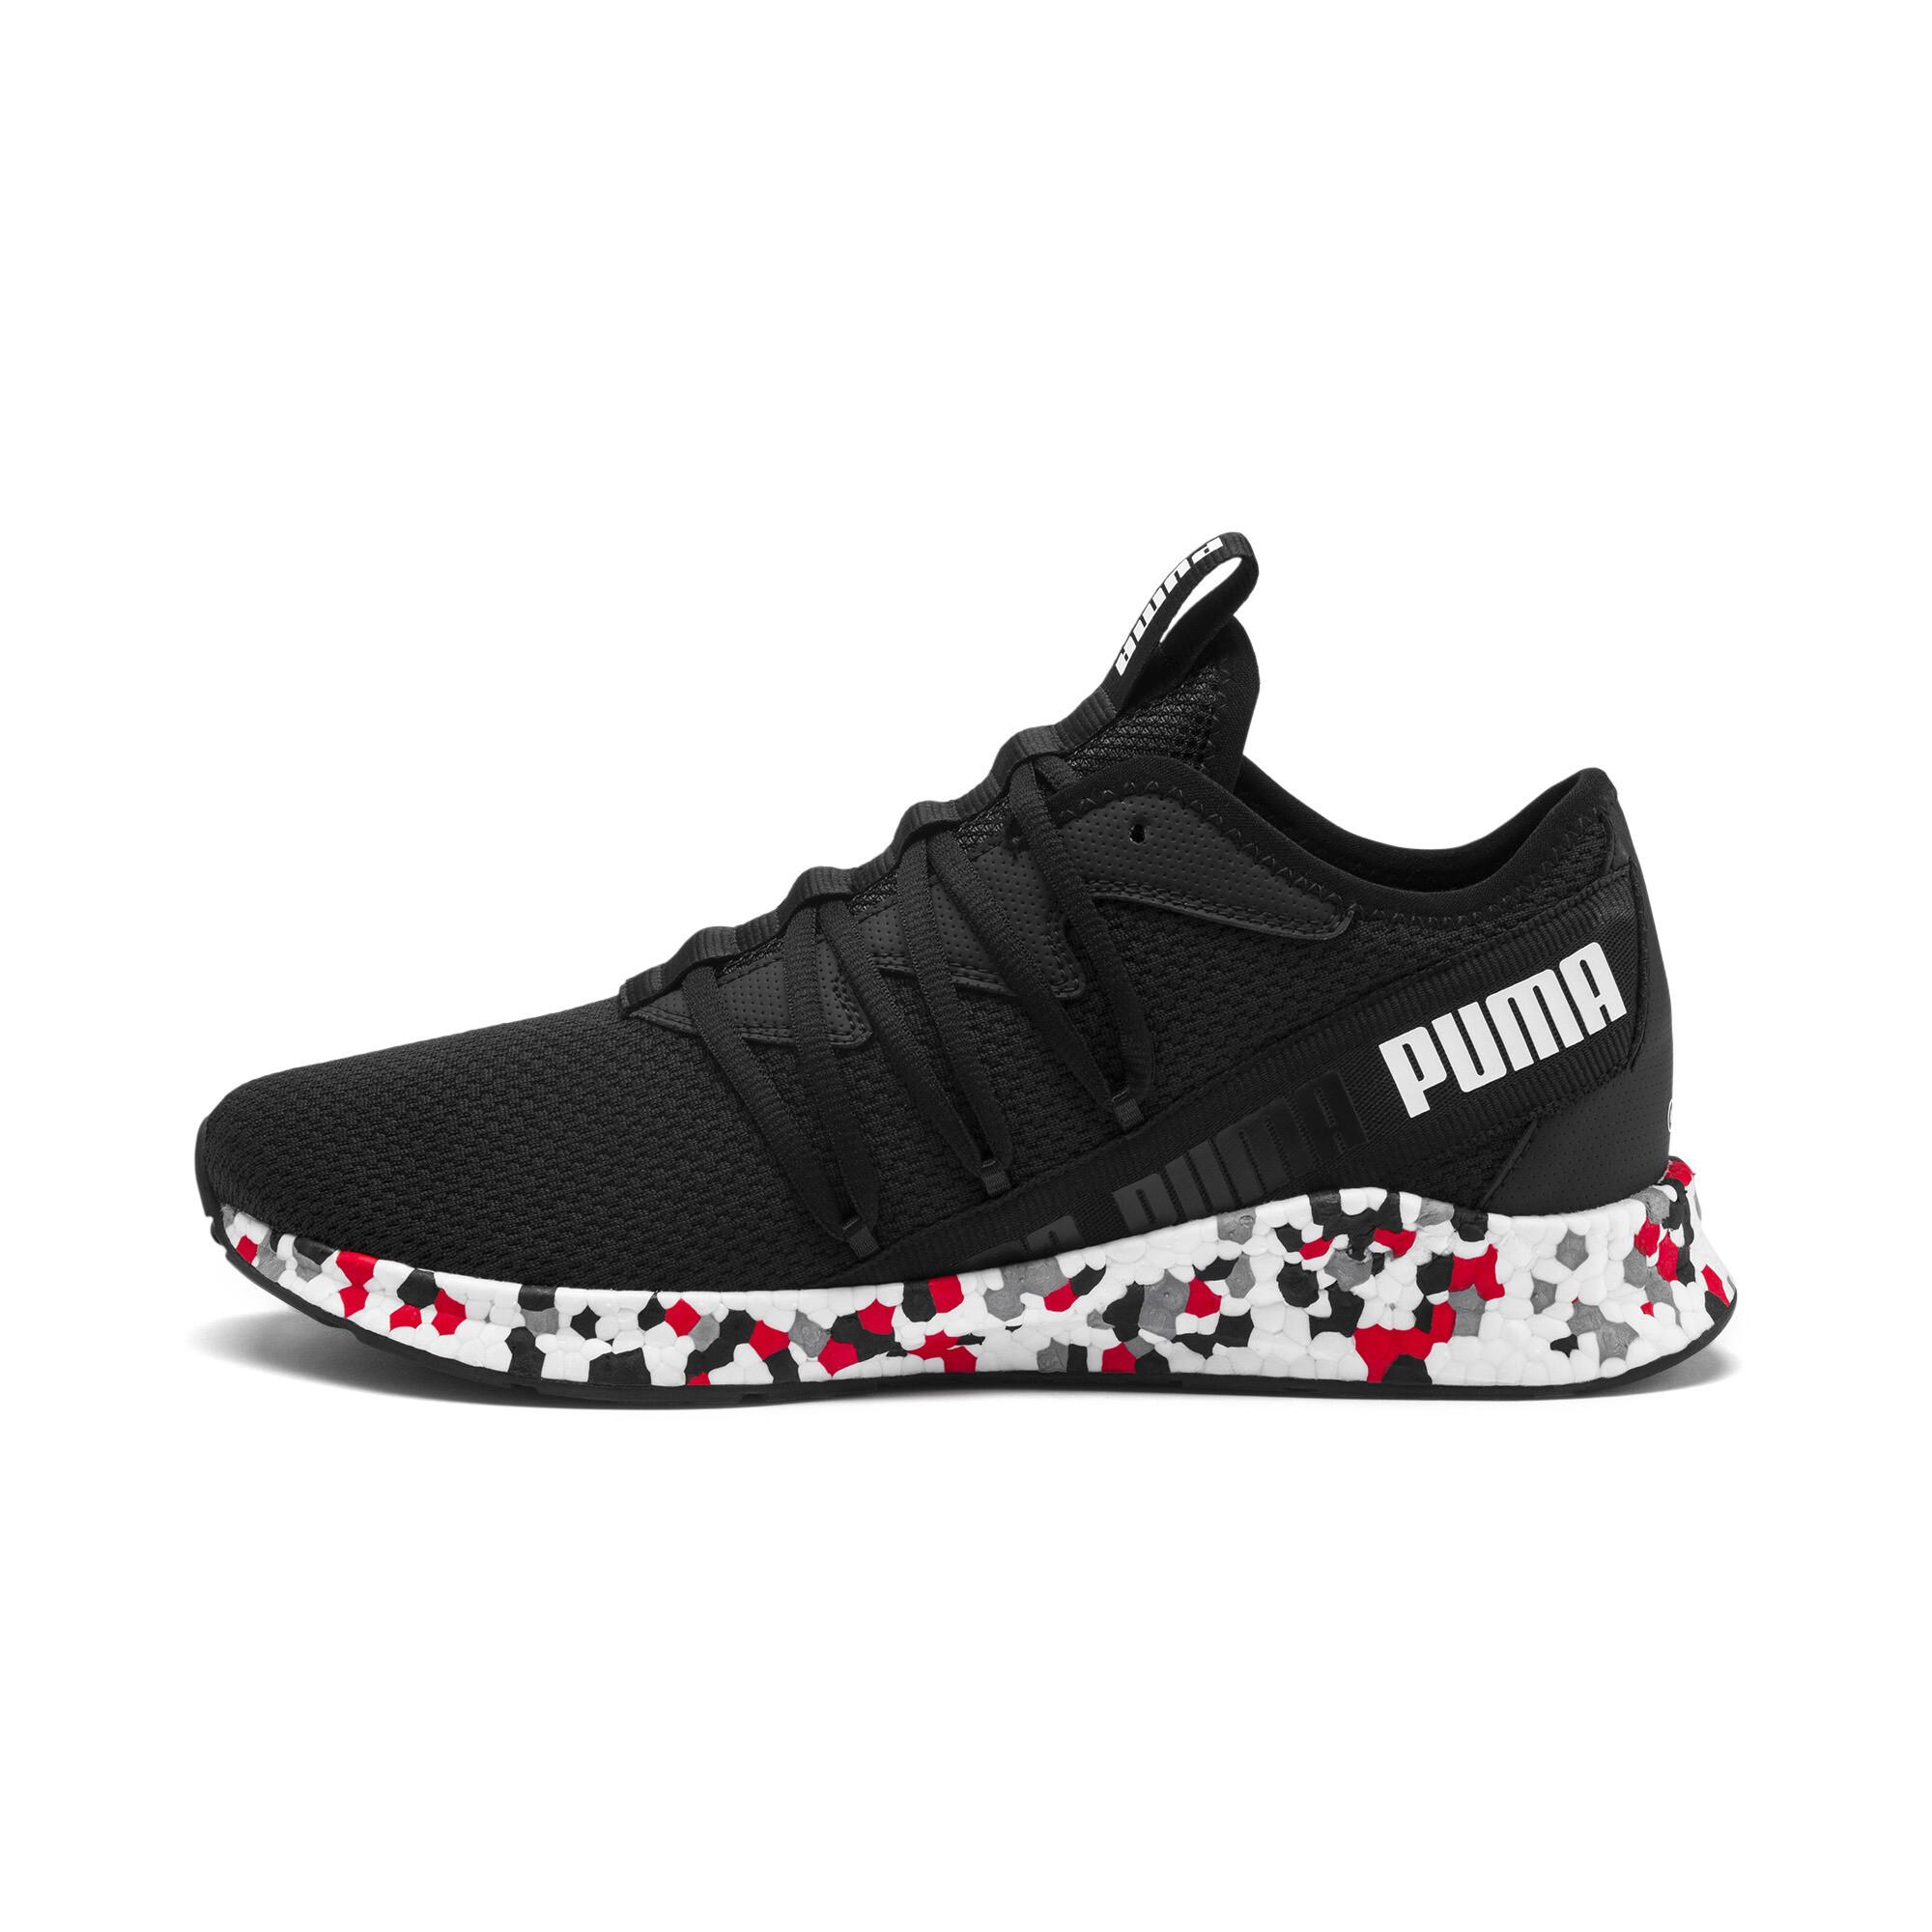 PUMA-NRGY-Star-Multi-Men-039-s-Running-Shoes-Unisex-Shoe-Running thumbnail 4